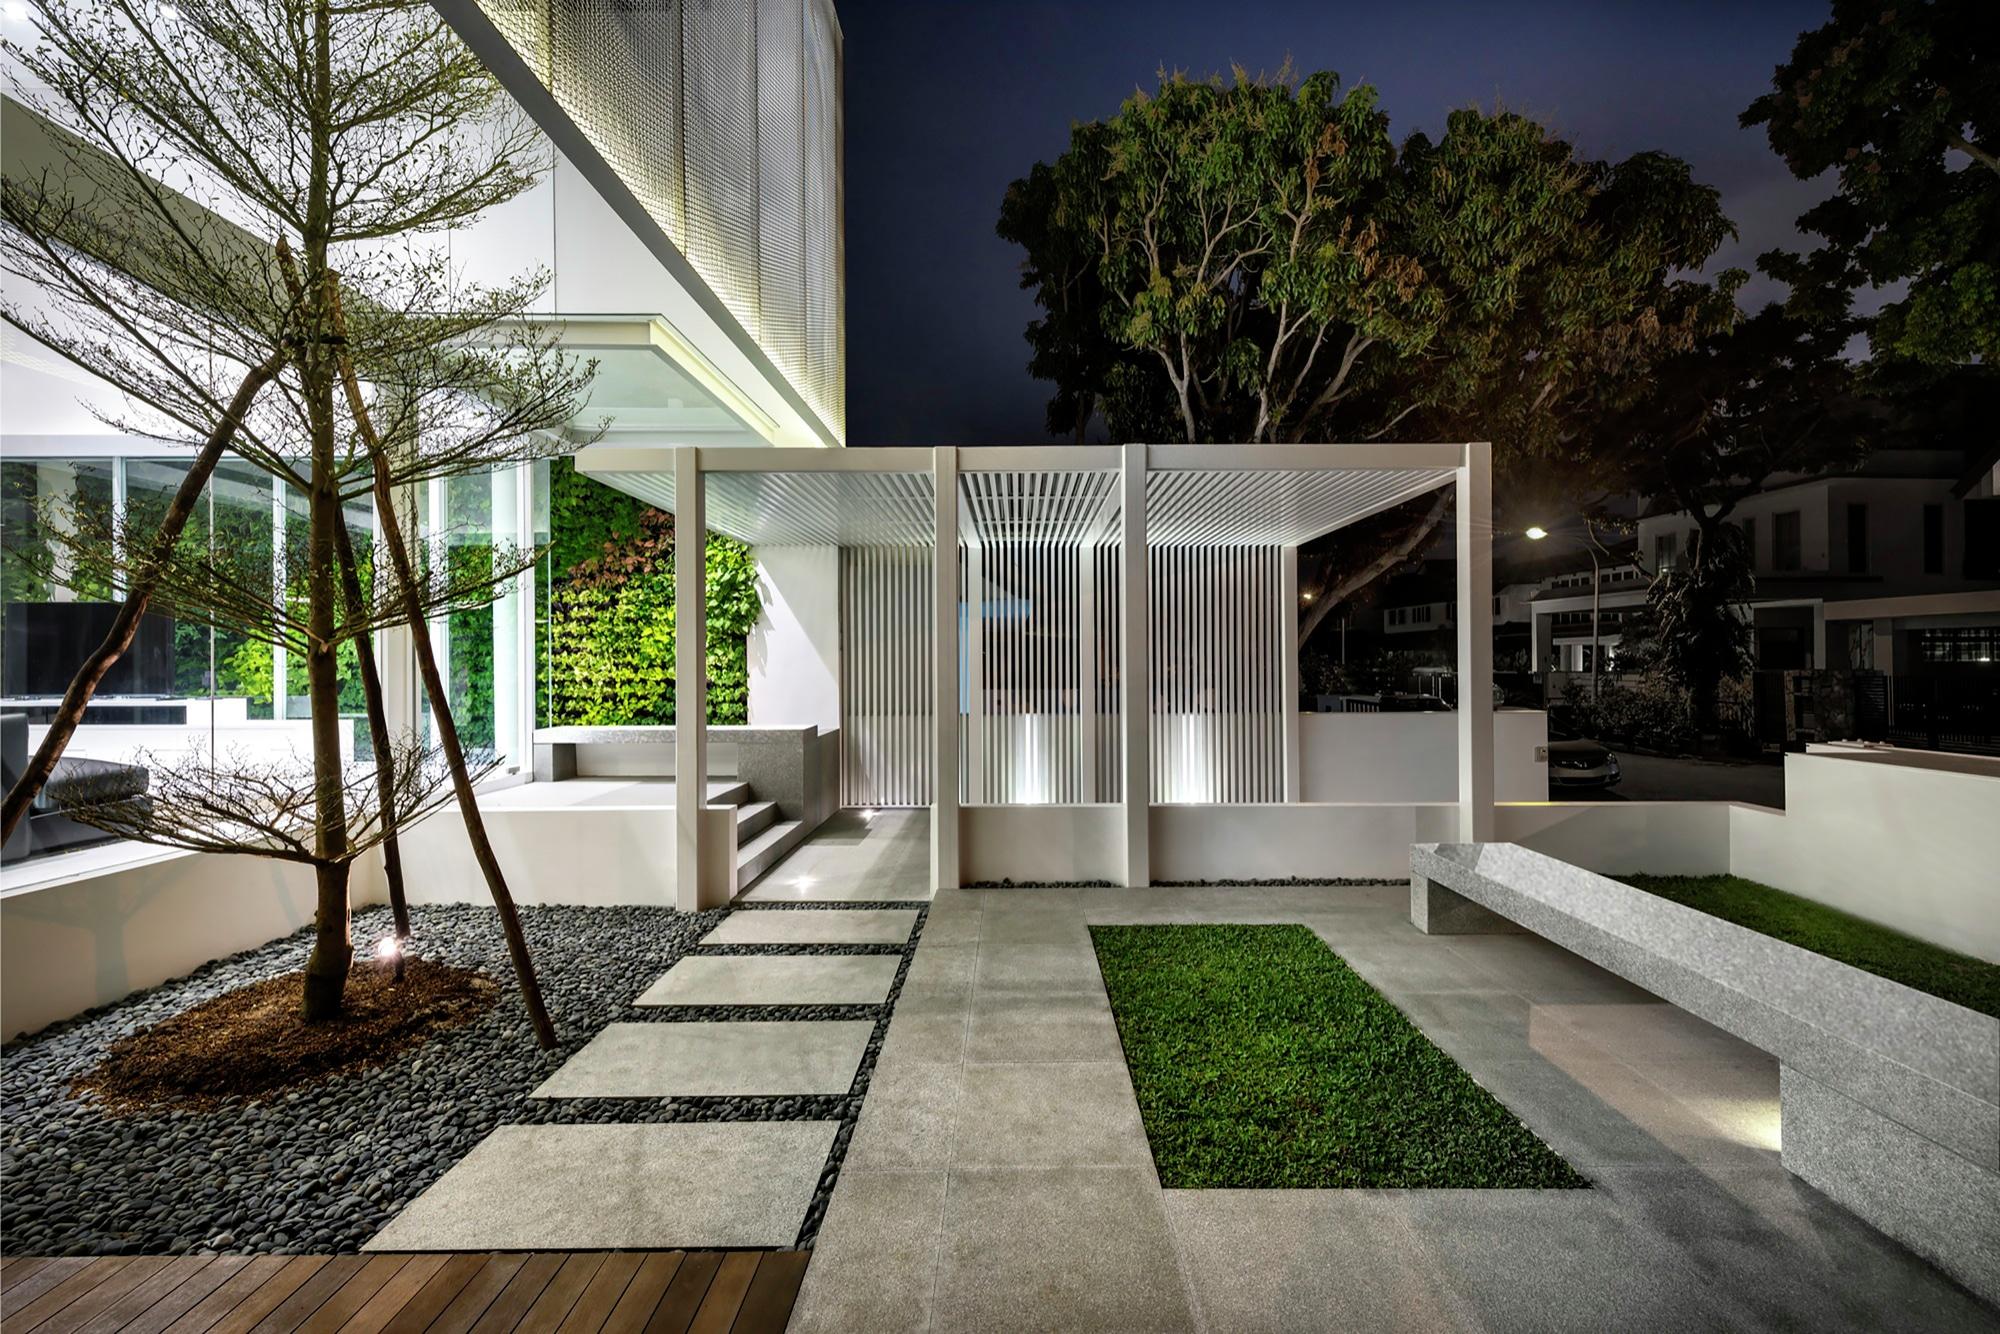 Casa moderna cuatro dormitorios for Jardines interiores de casas modernas